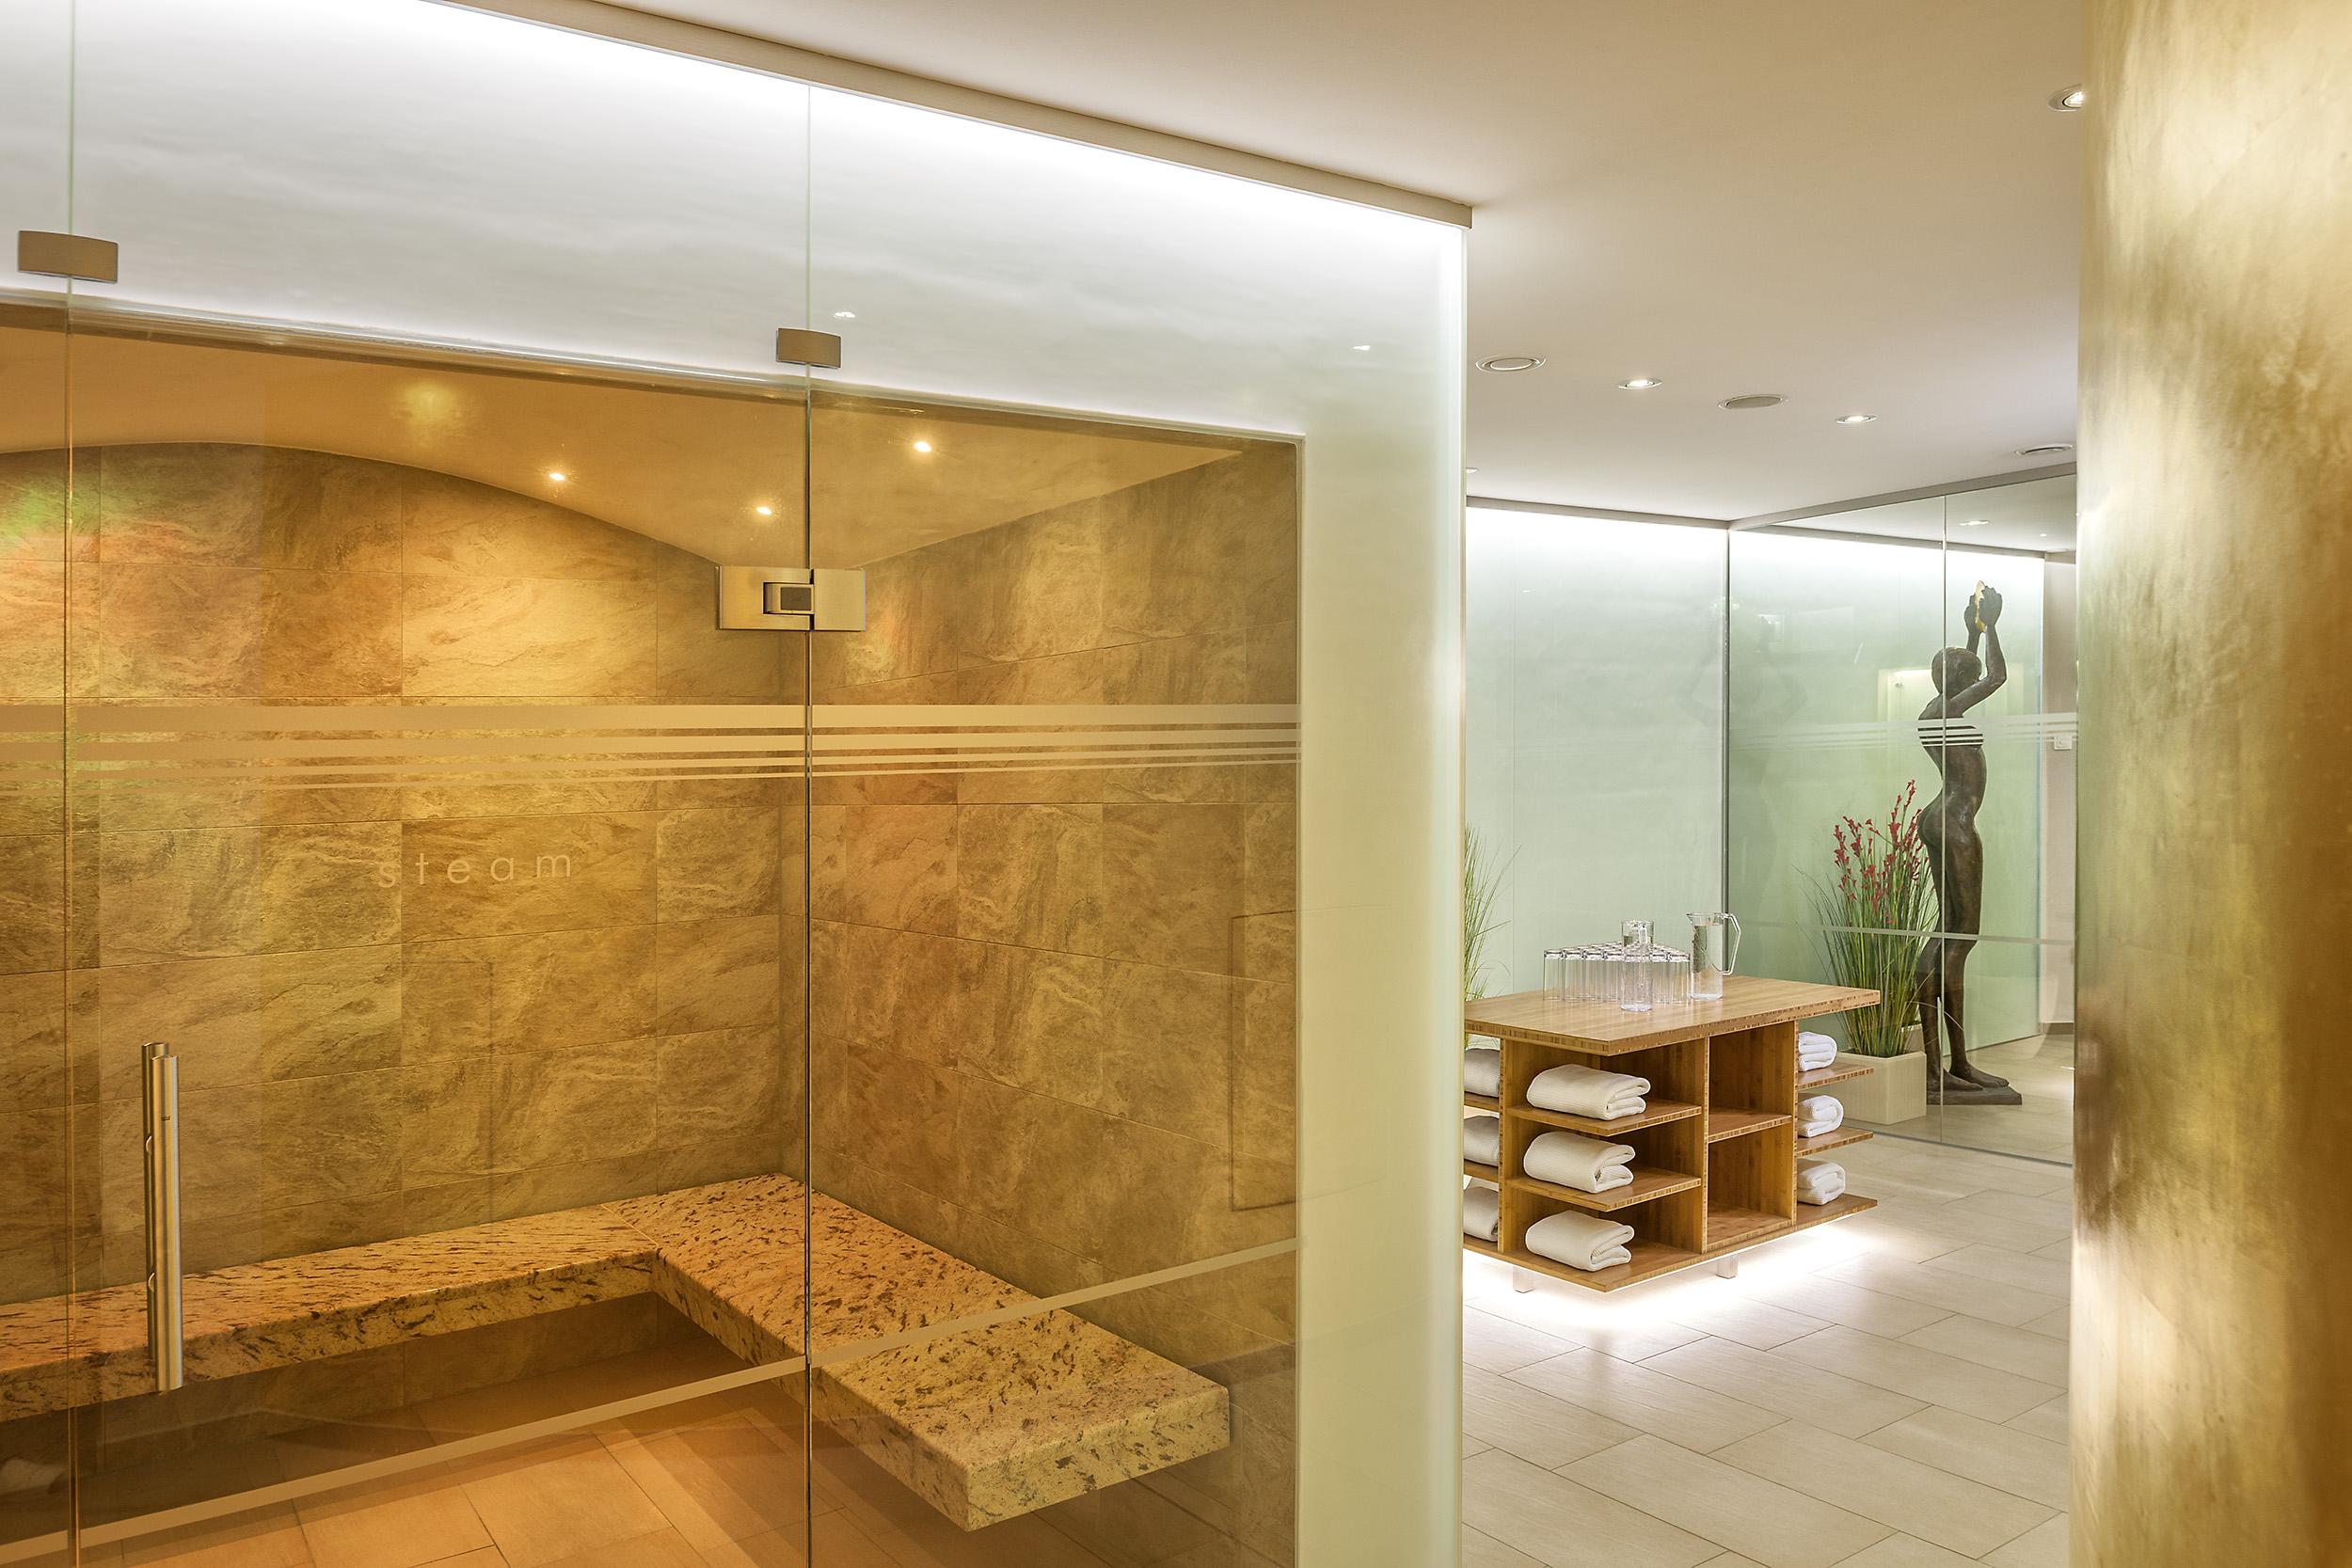 ROEWERS-Pool-Sauna_13-Foto-Burwitz-Pocha